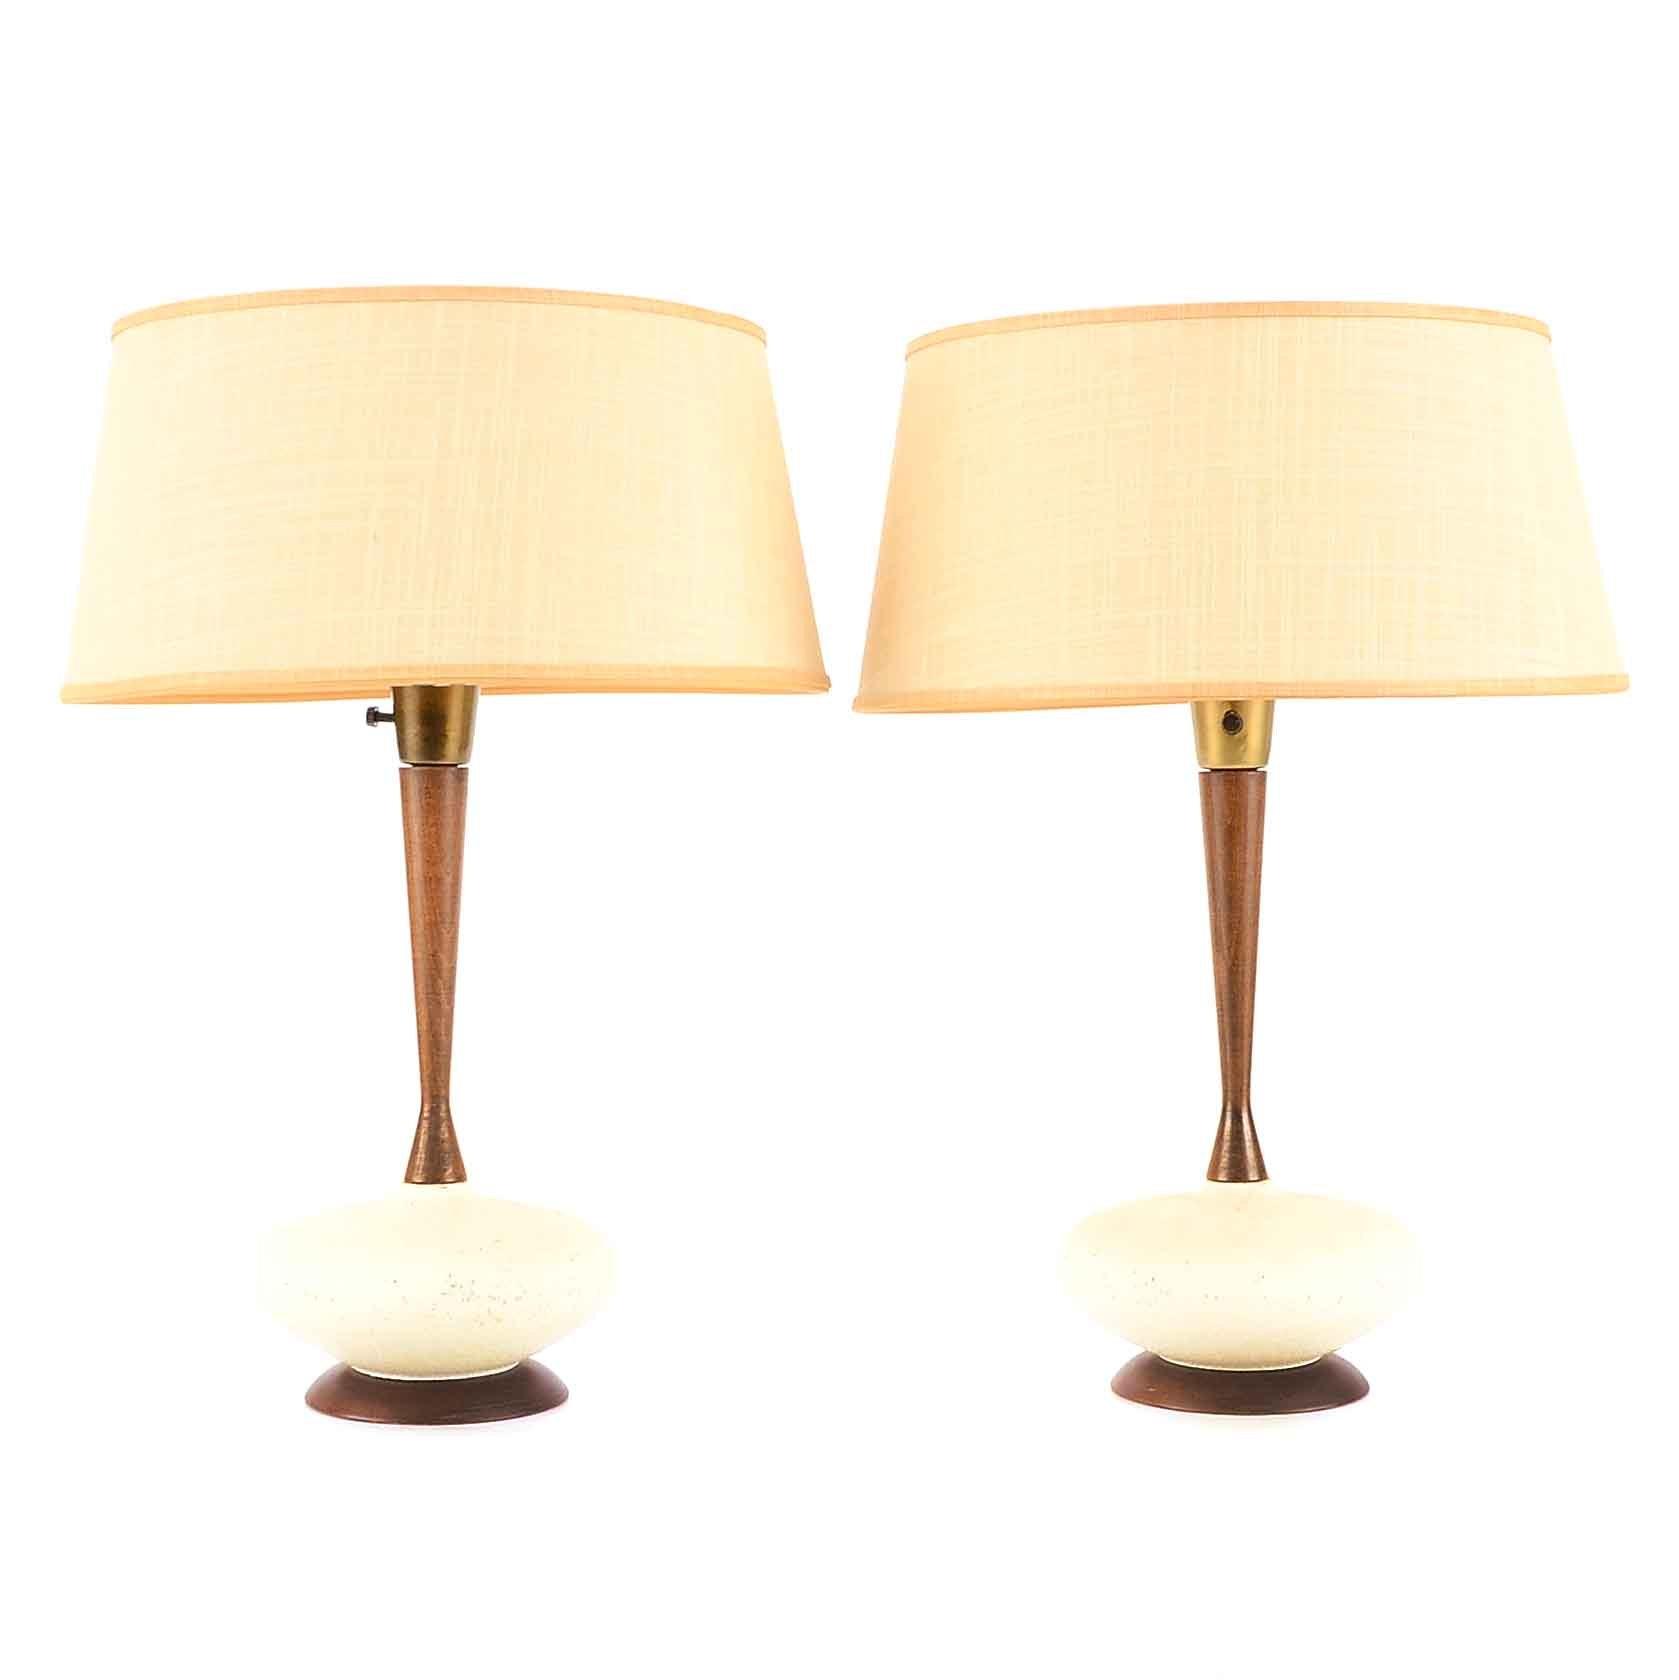 Attirant Pair Of Mid Century Modern Table Lamps ...